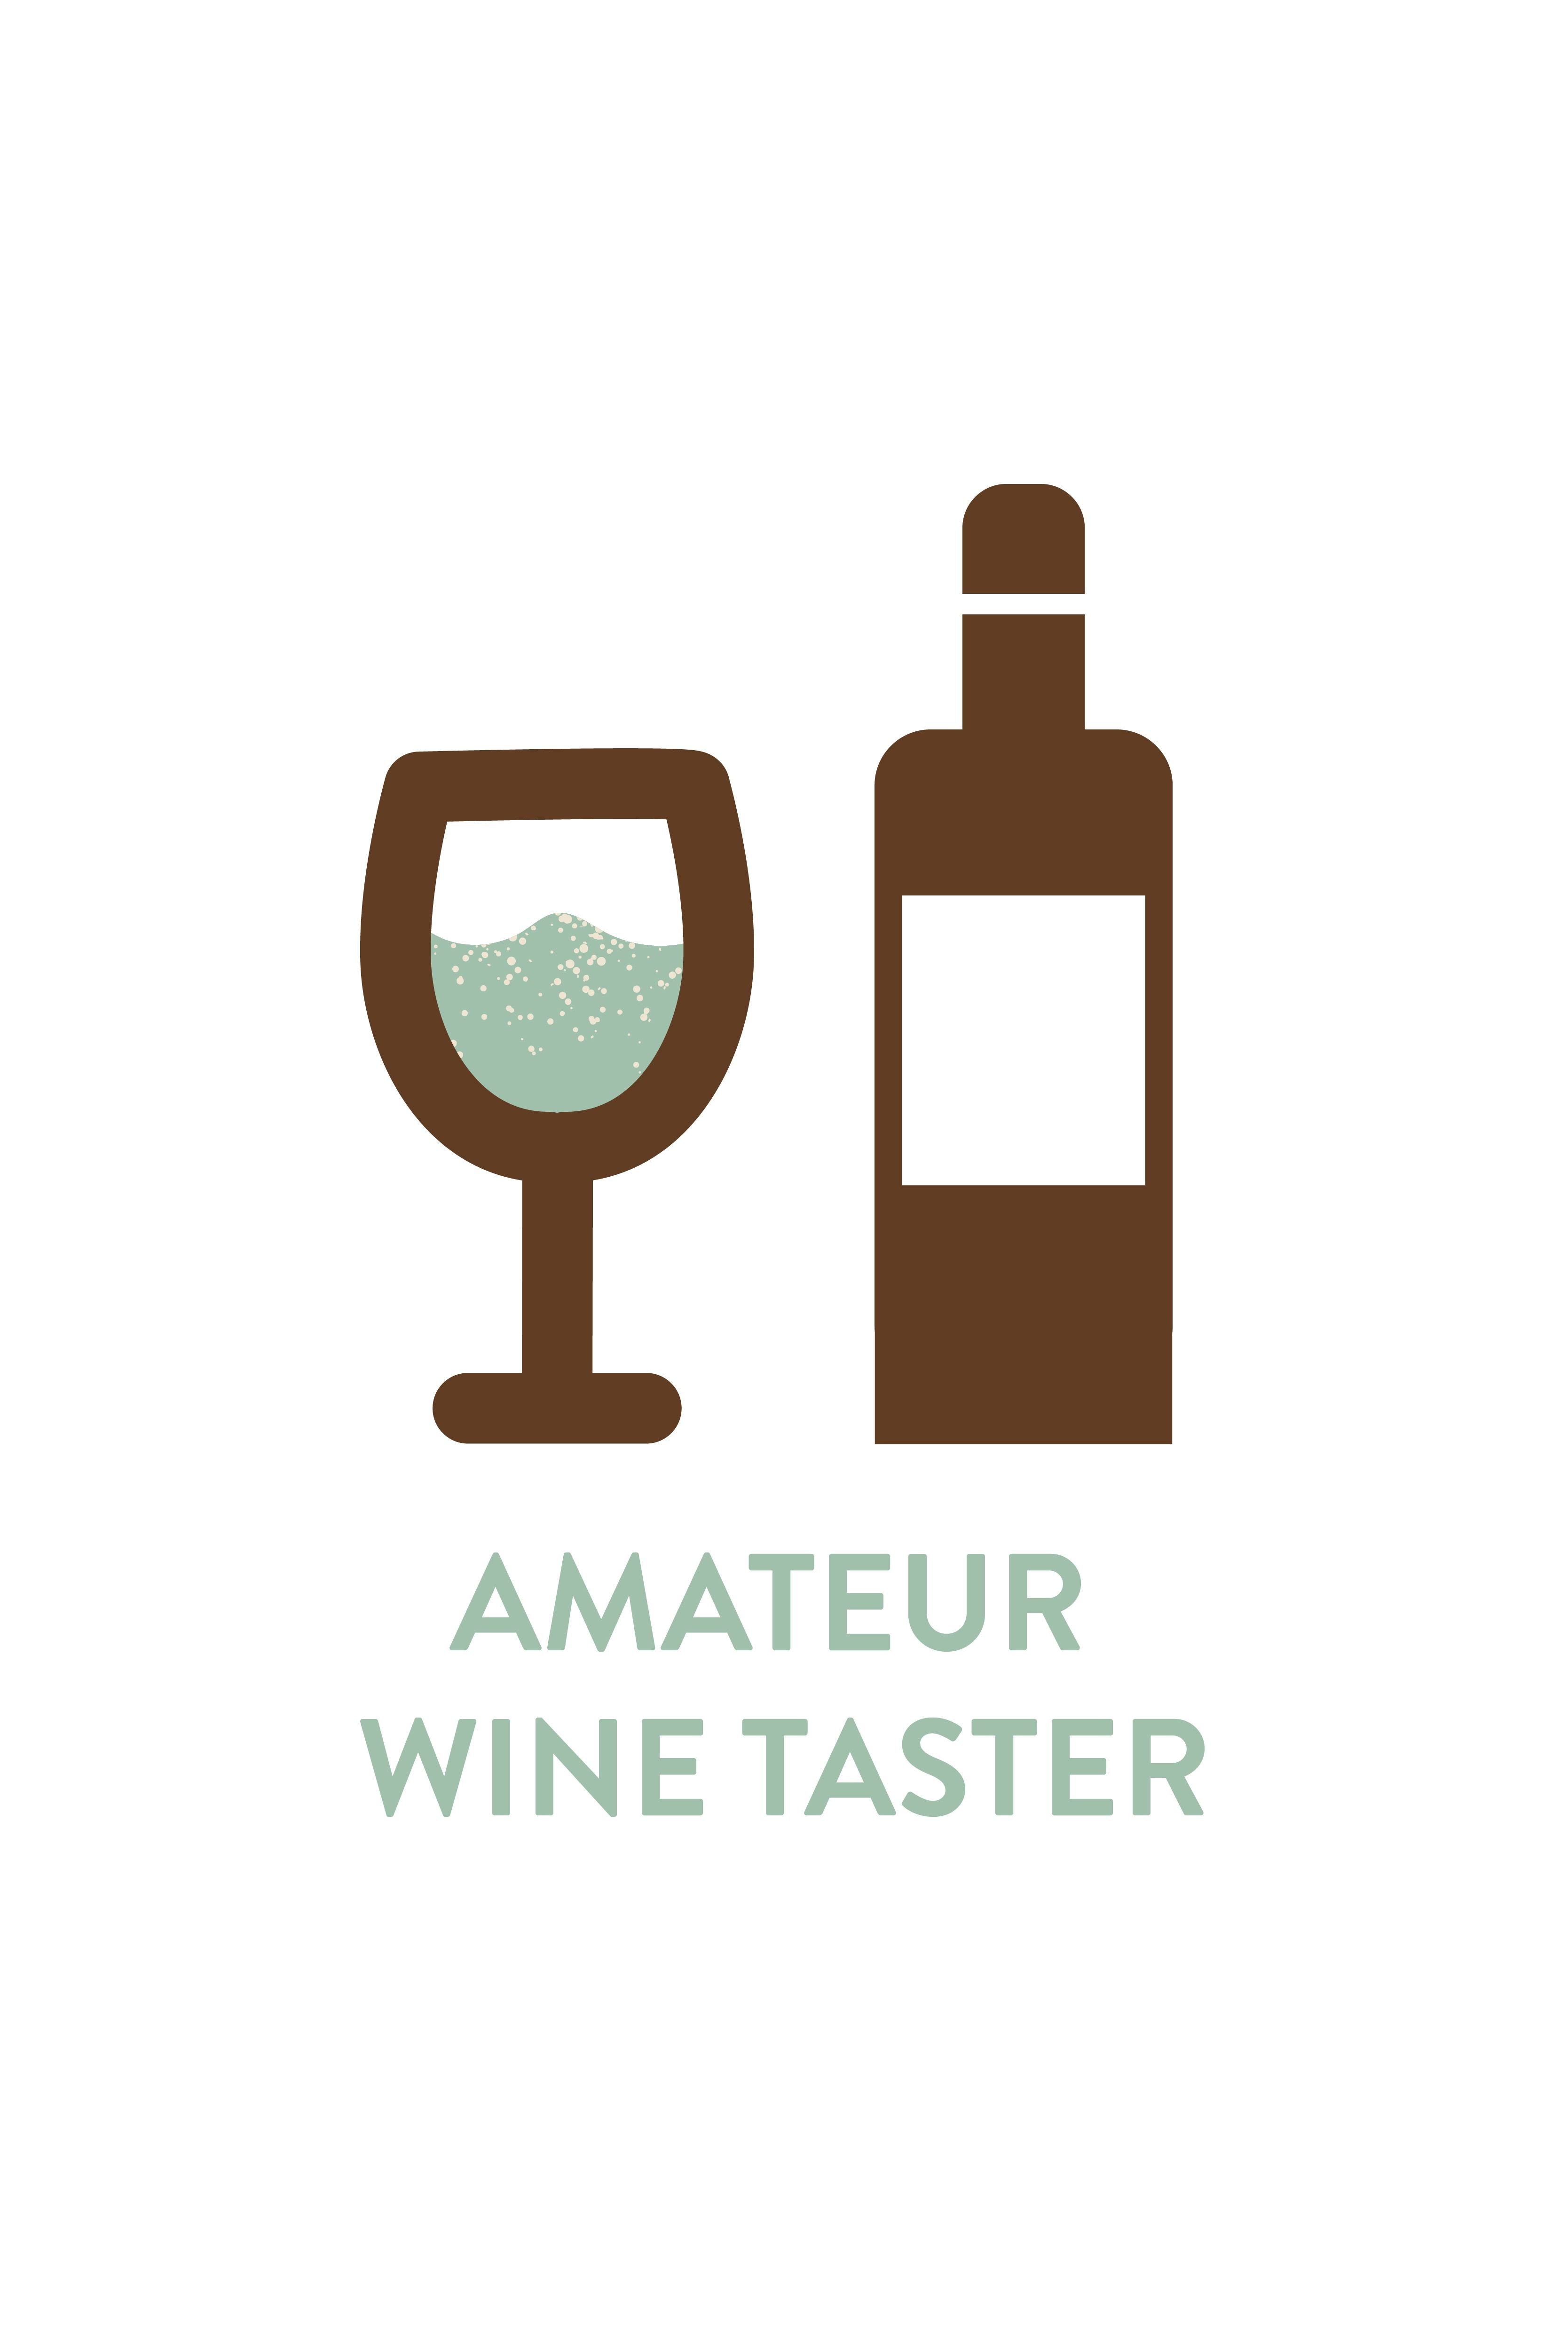 Amateur Wine Taster Icon | Resume Branding | Graphic Designer ...